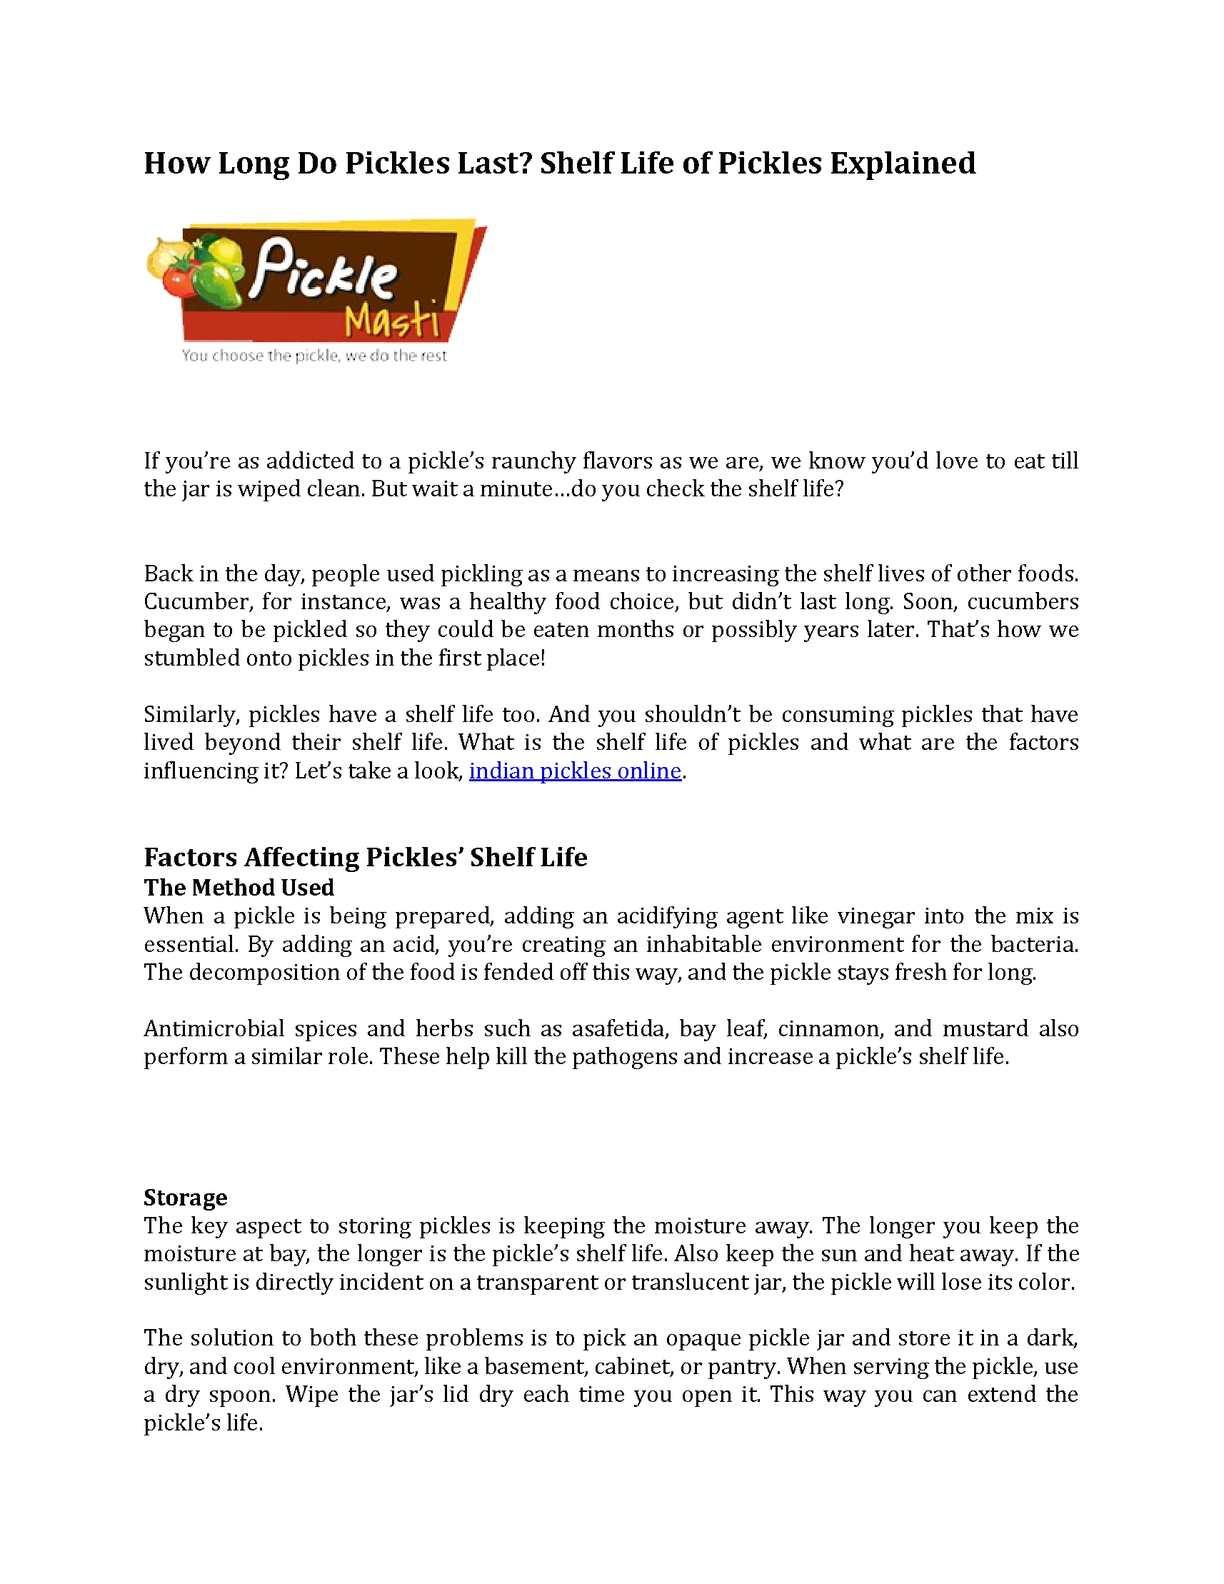 Calaméo - How Long Do Pickles Last? Shelf Life of Pickles